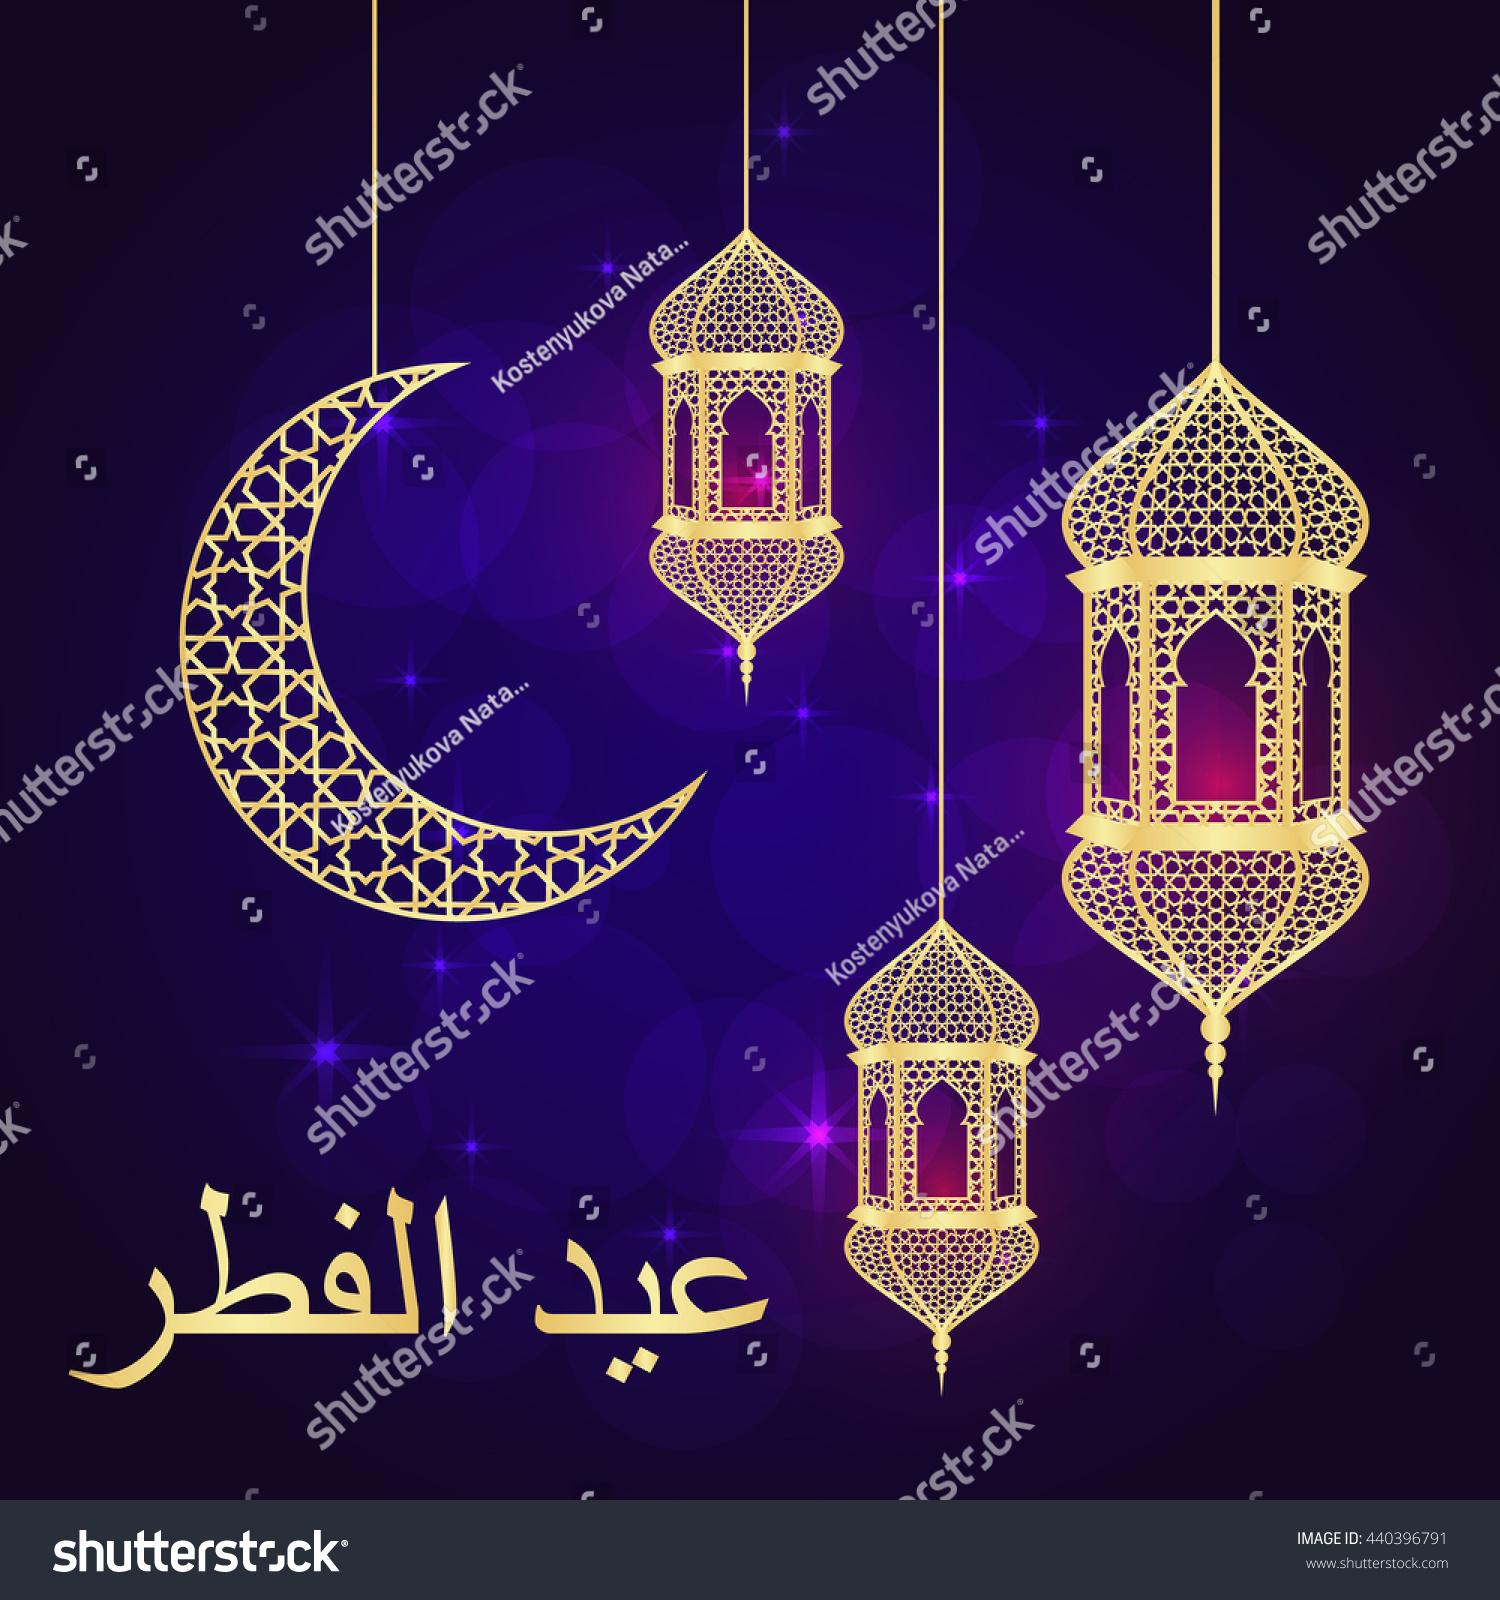 Beautiful Id Festival Eid Al-Fitr Greeting - stock-vector-eid-al-fitr-greeting-card-on-violet-background-vector-illustration-eid-al-fitr-means-festival-of-440396791  Graphic_614077 .jpg